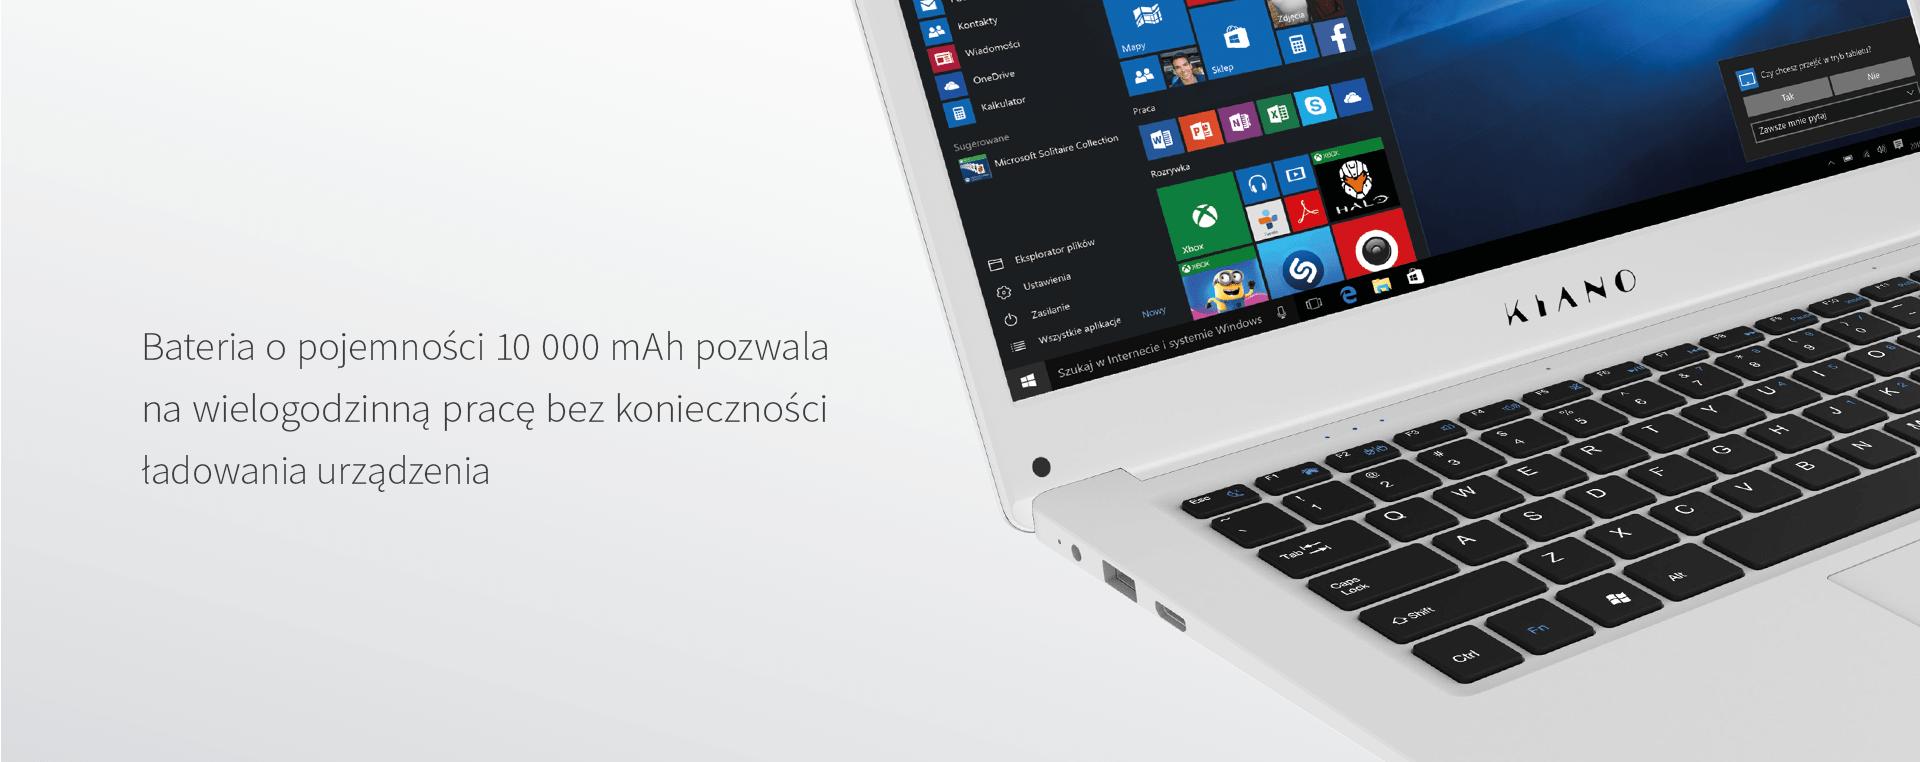 38f0350ae7cb3 Laptop KIANO Laptop KIANO SlimNote 14.2 Srebrny – sklep internetowy ...